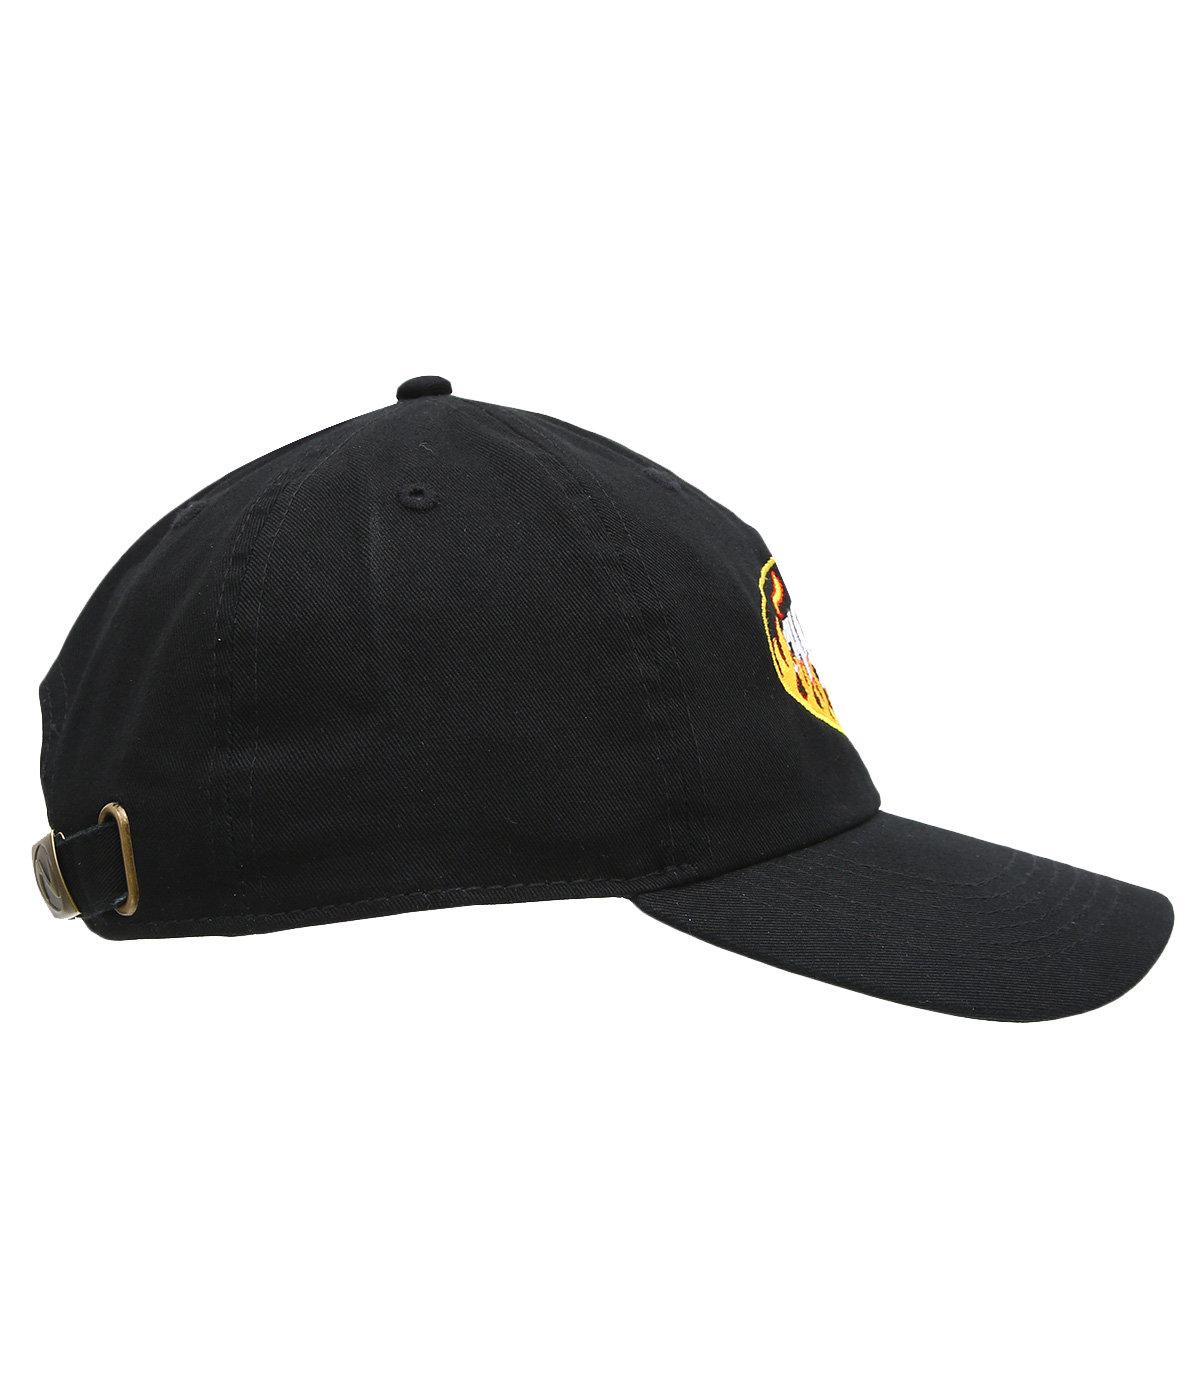 FIRE CAP